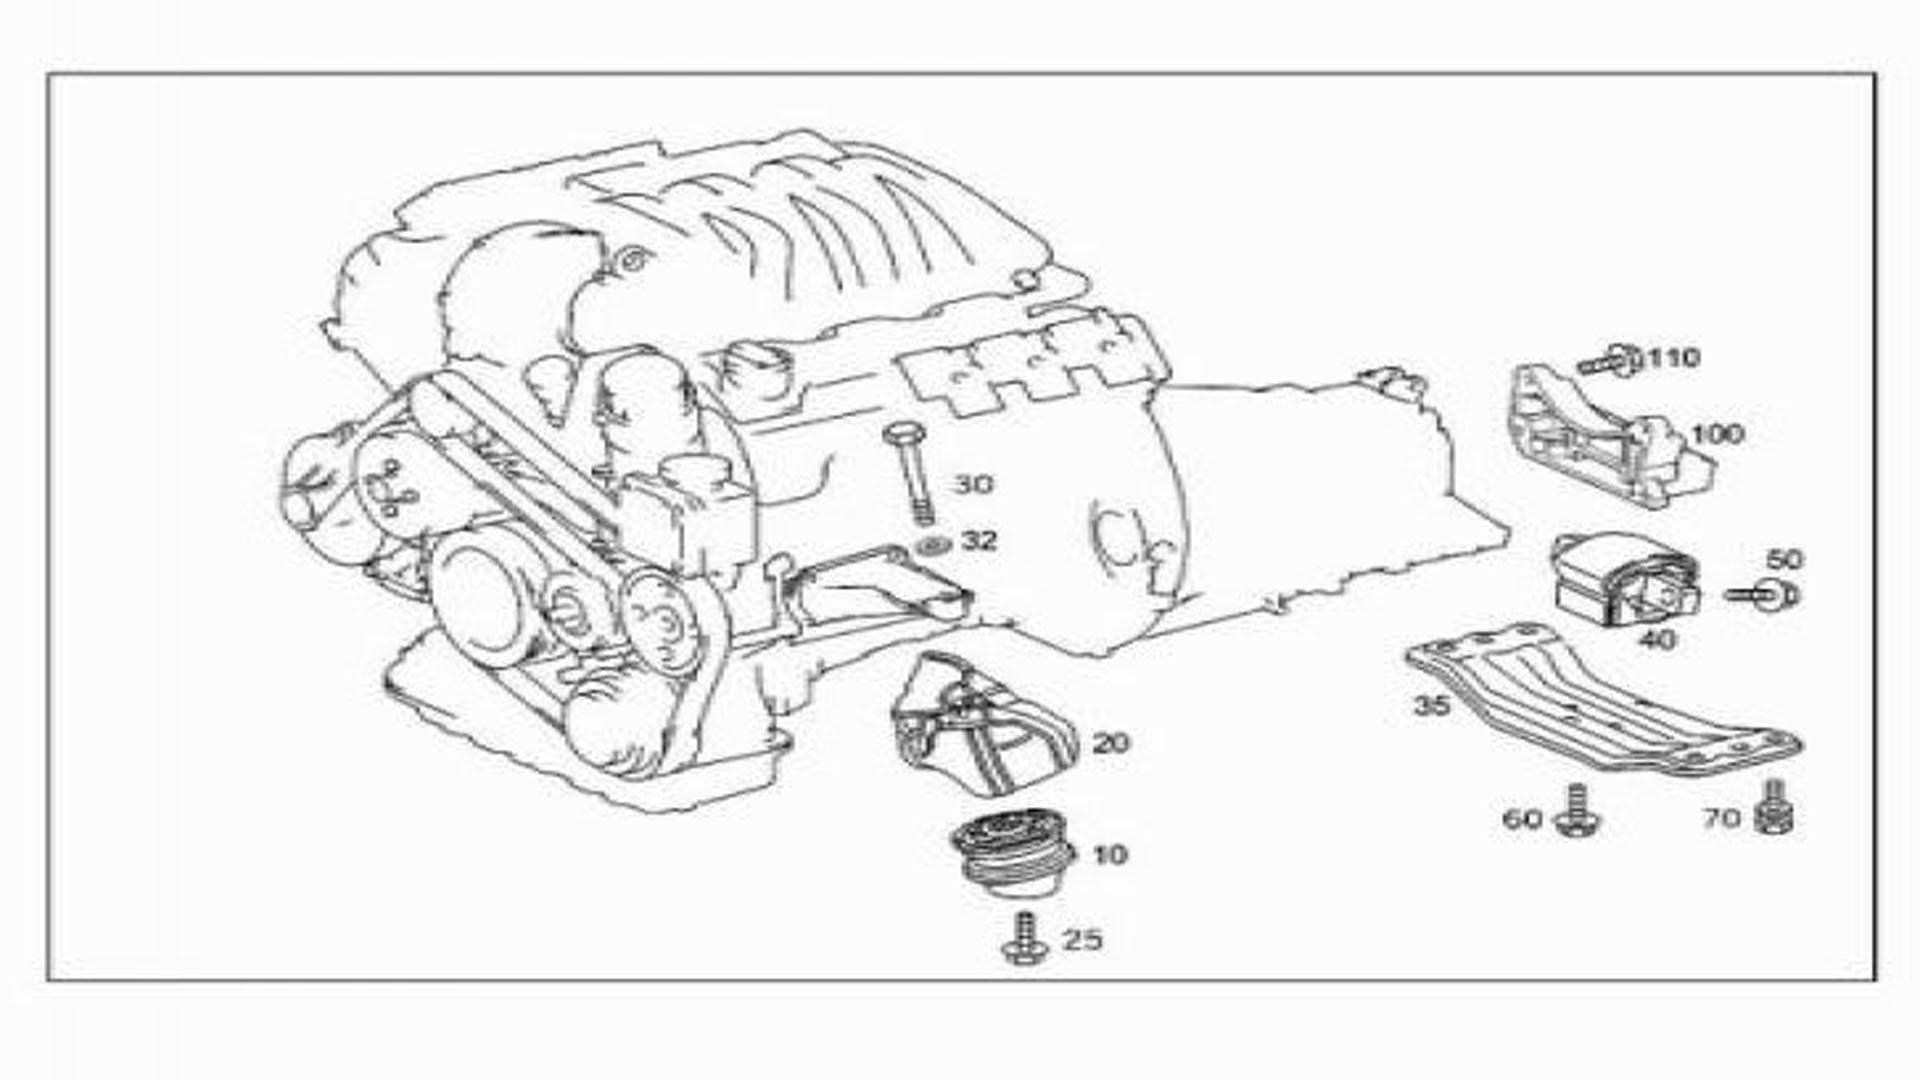 Astonishing Mercedes Benz Interactive Wiring Diagram Eclass Auto Electrical Wiring Digital Resources Remcakbiperorg